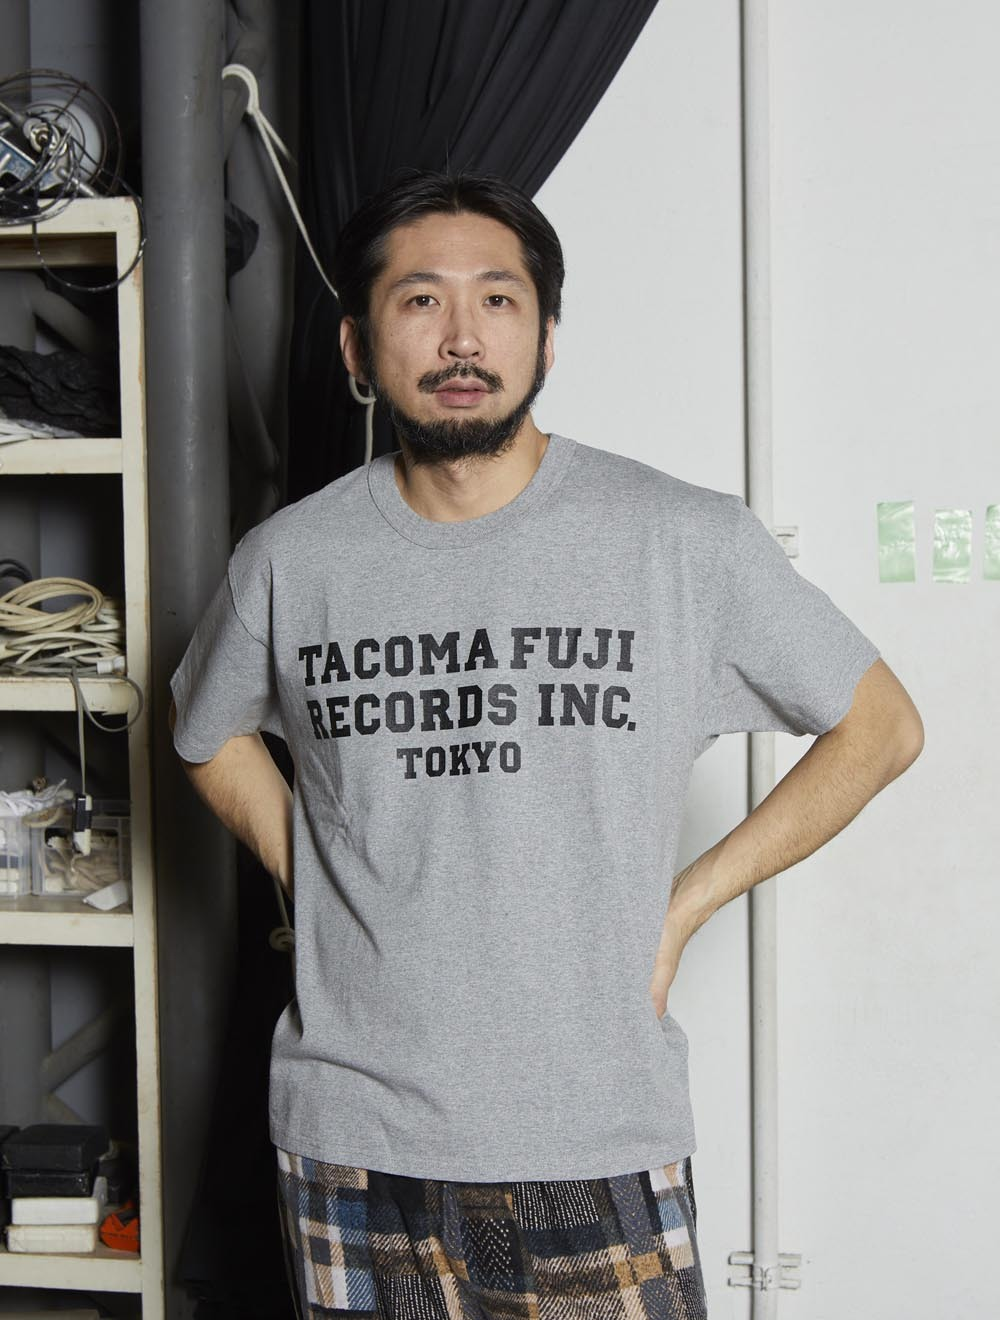 TACOMA FUJI RECORDS, INC. のご案内_a0152253_13580851.jpg